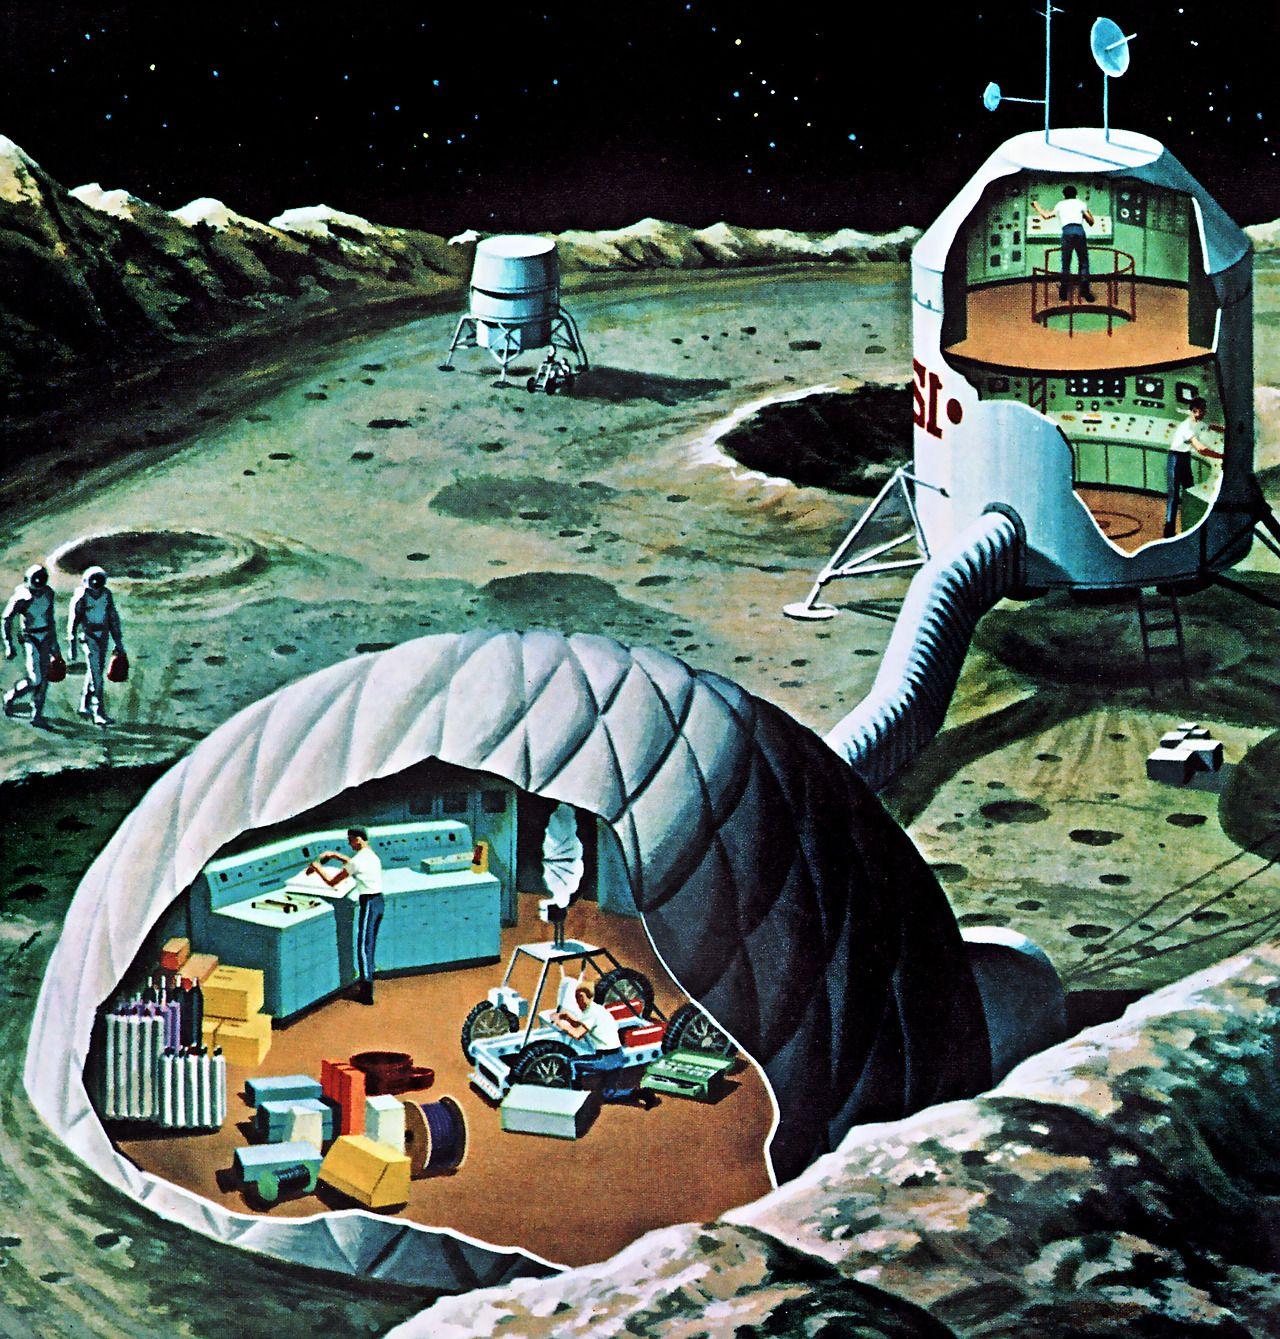 459 Best Retro Future Character Images On Pinterest: Moon Base, Retrofuturism